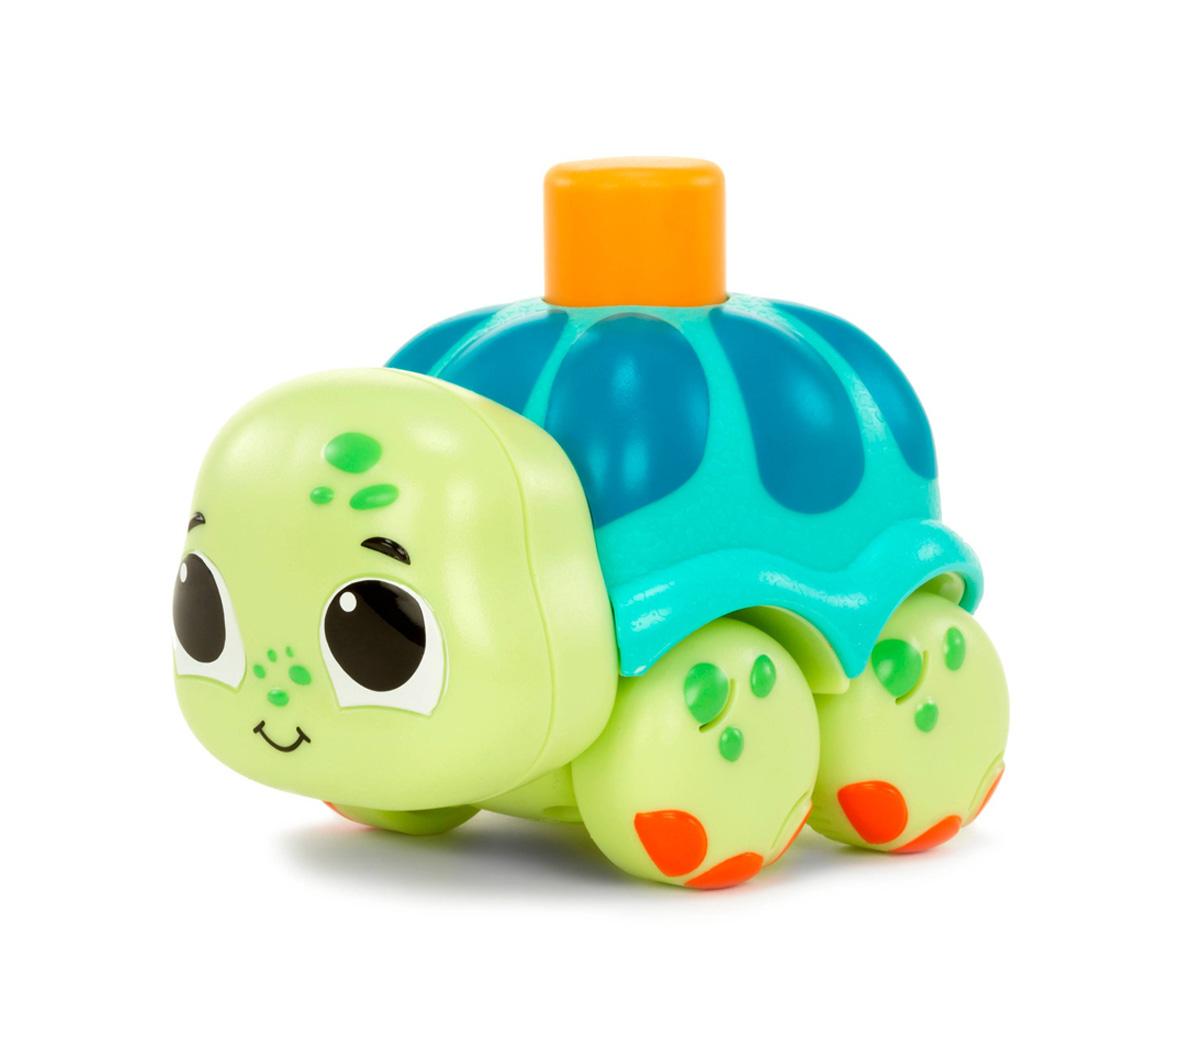 Colorful Turtle Bath Toy Frieze Bathtub Ideas